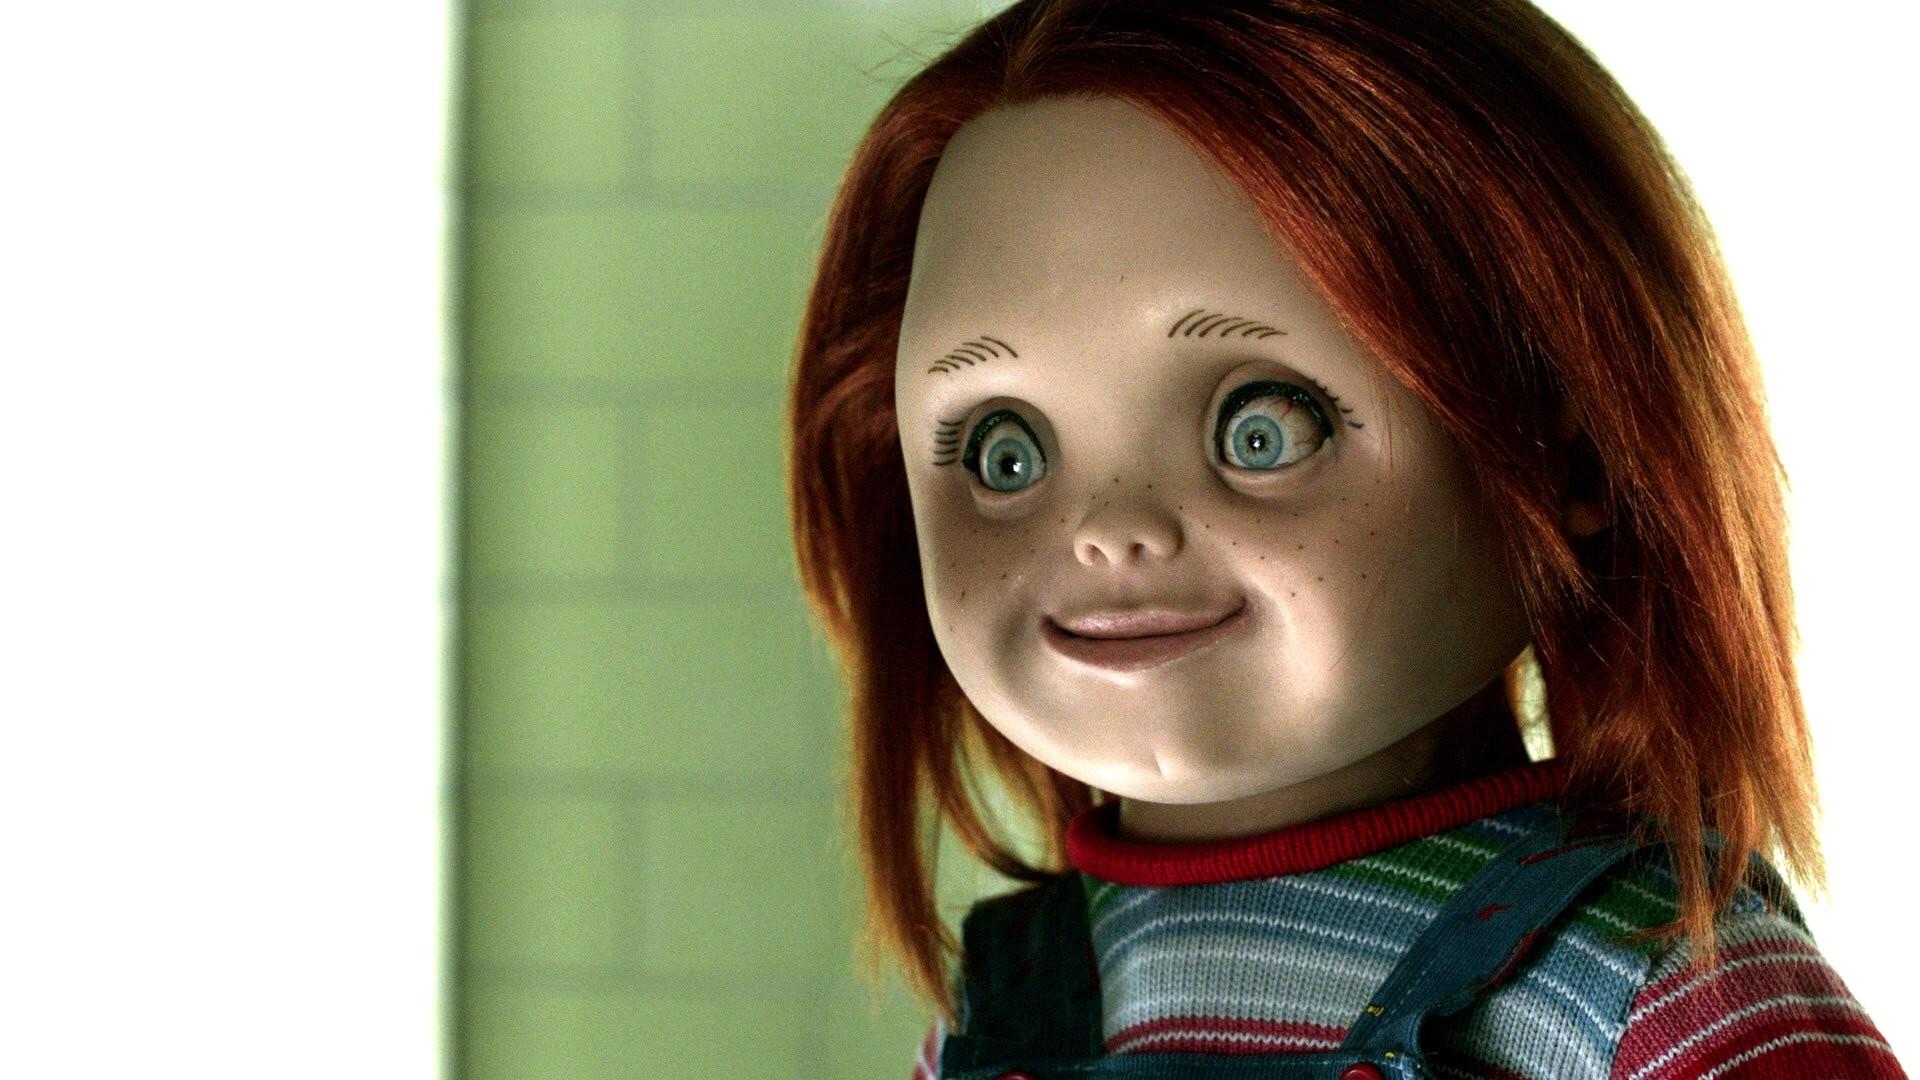 CHILDS PLAY chucky dark horror creepy scary (20) wallpaper      235523   WallpaperUP